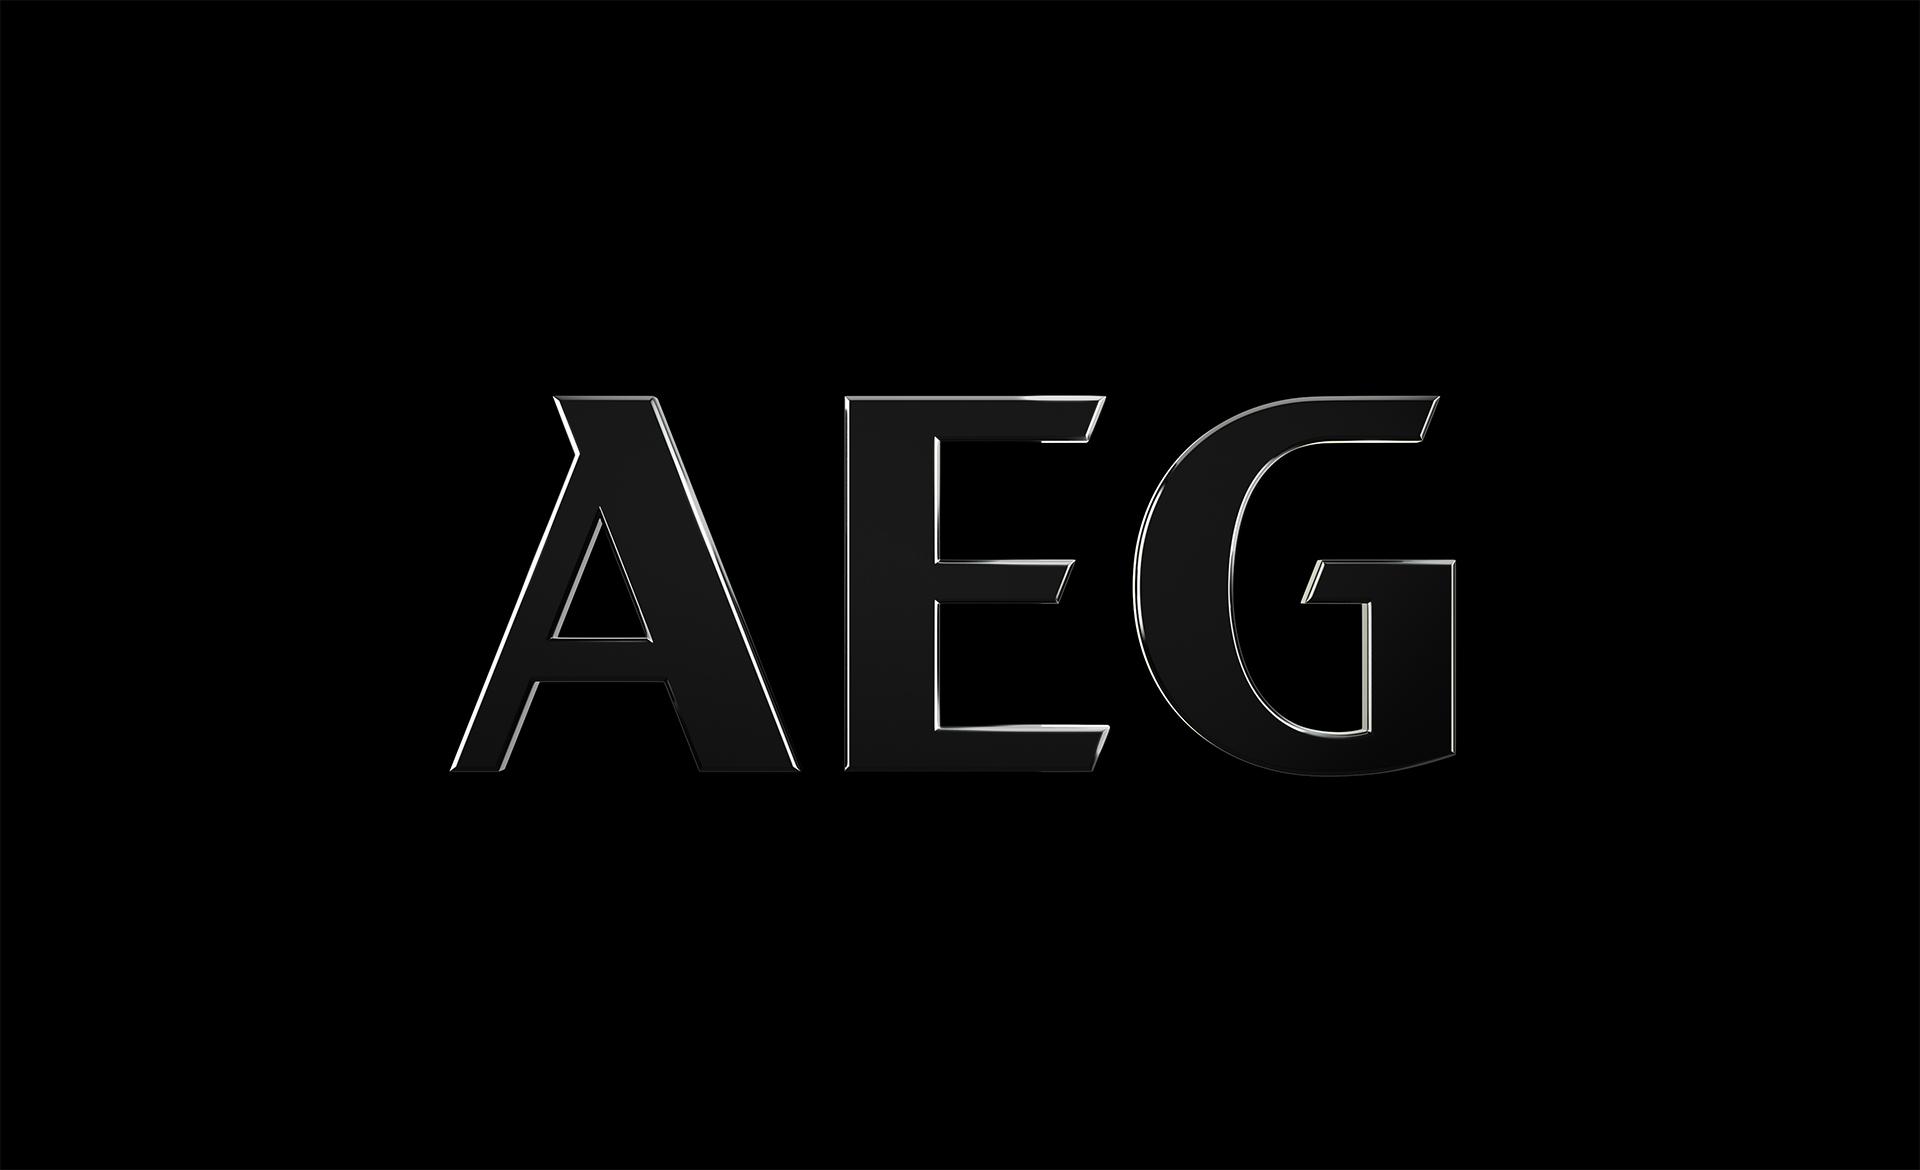 0007_AEG_Logo_Animation_Final_Reveal_V2_0099